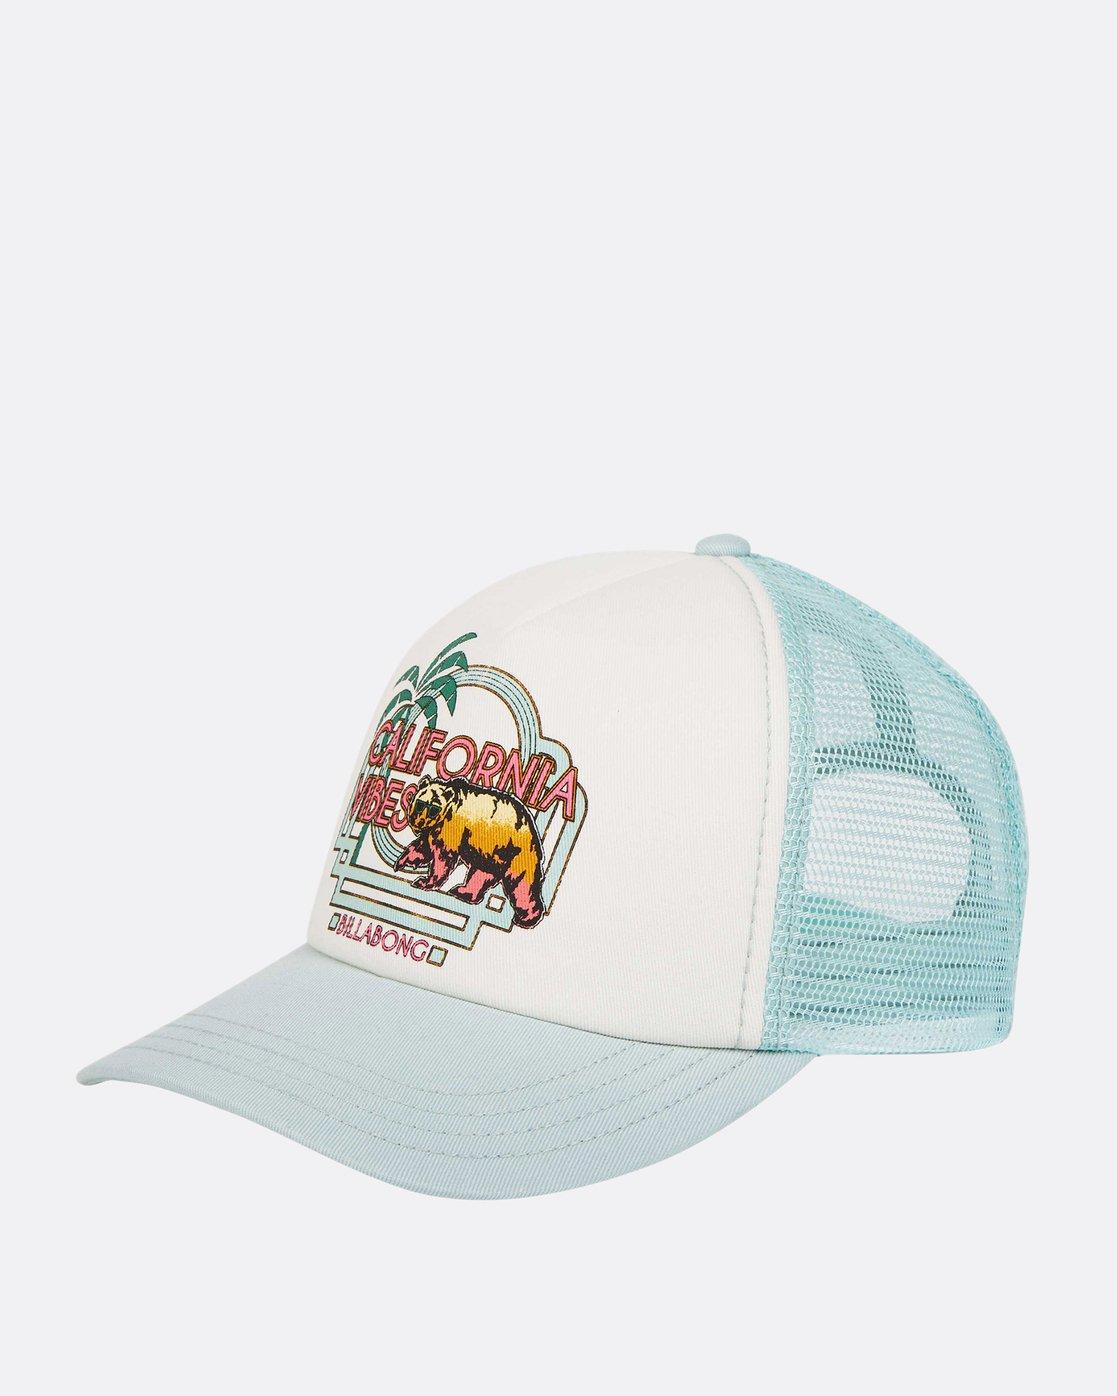 39369bbc364 0 Girls  Cali Vibes Trucker Hat GAHWTBCA Billabong